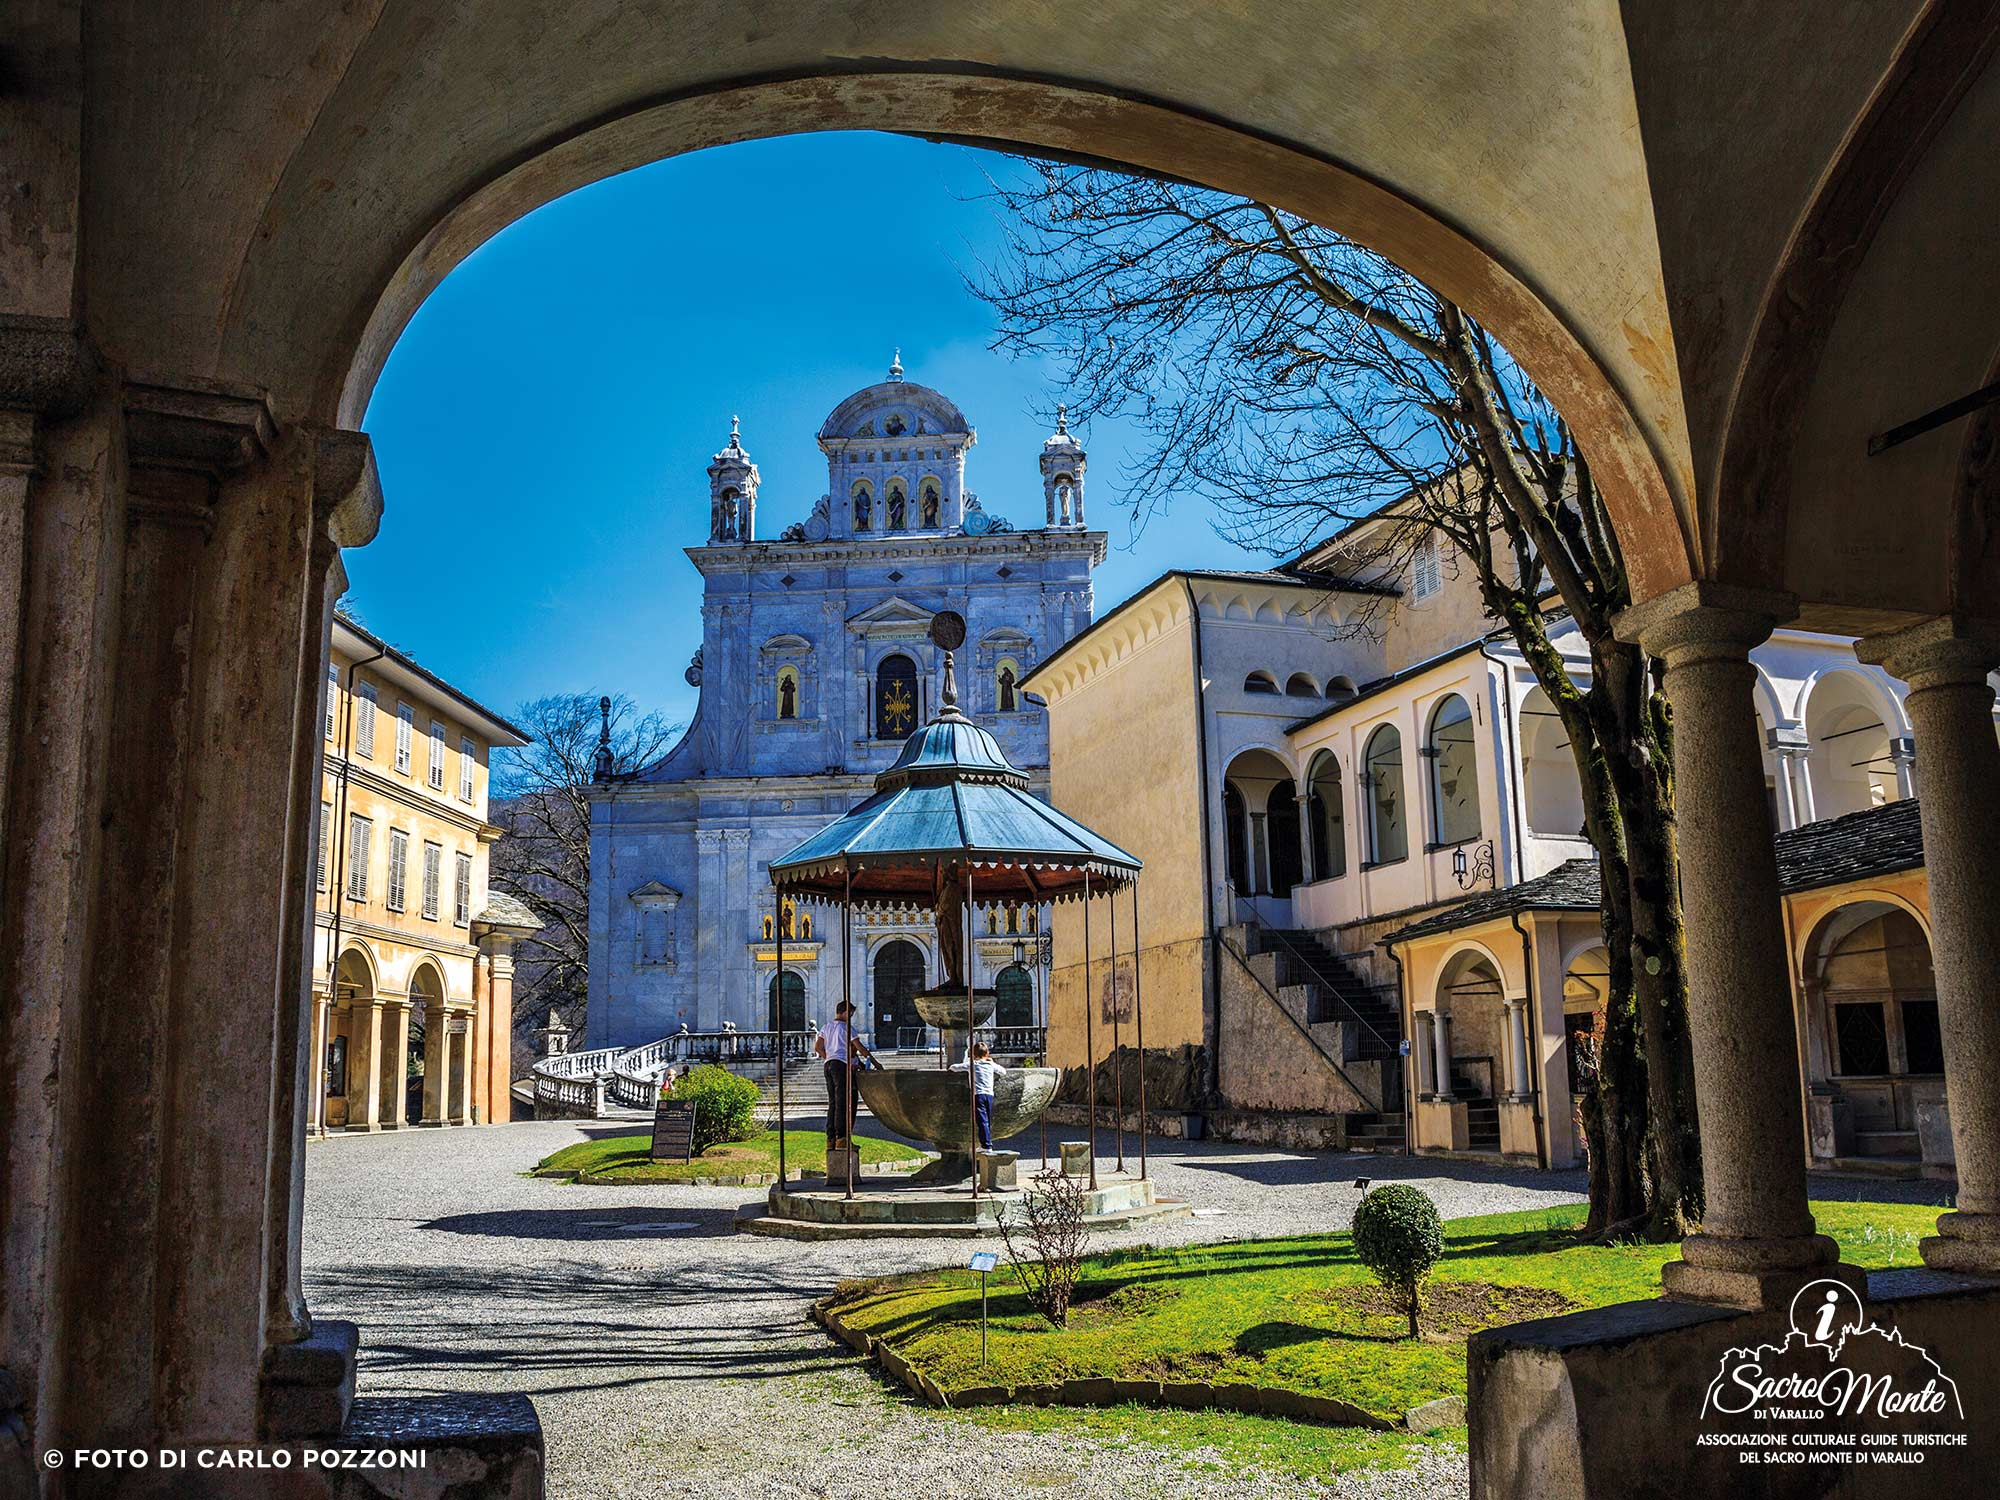 Sacro Monte di Varallo, basilica